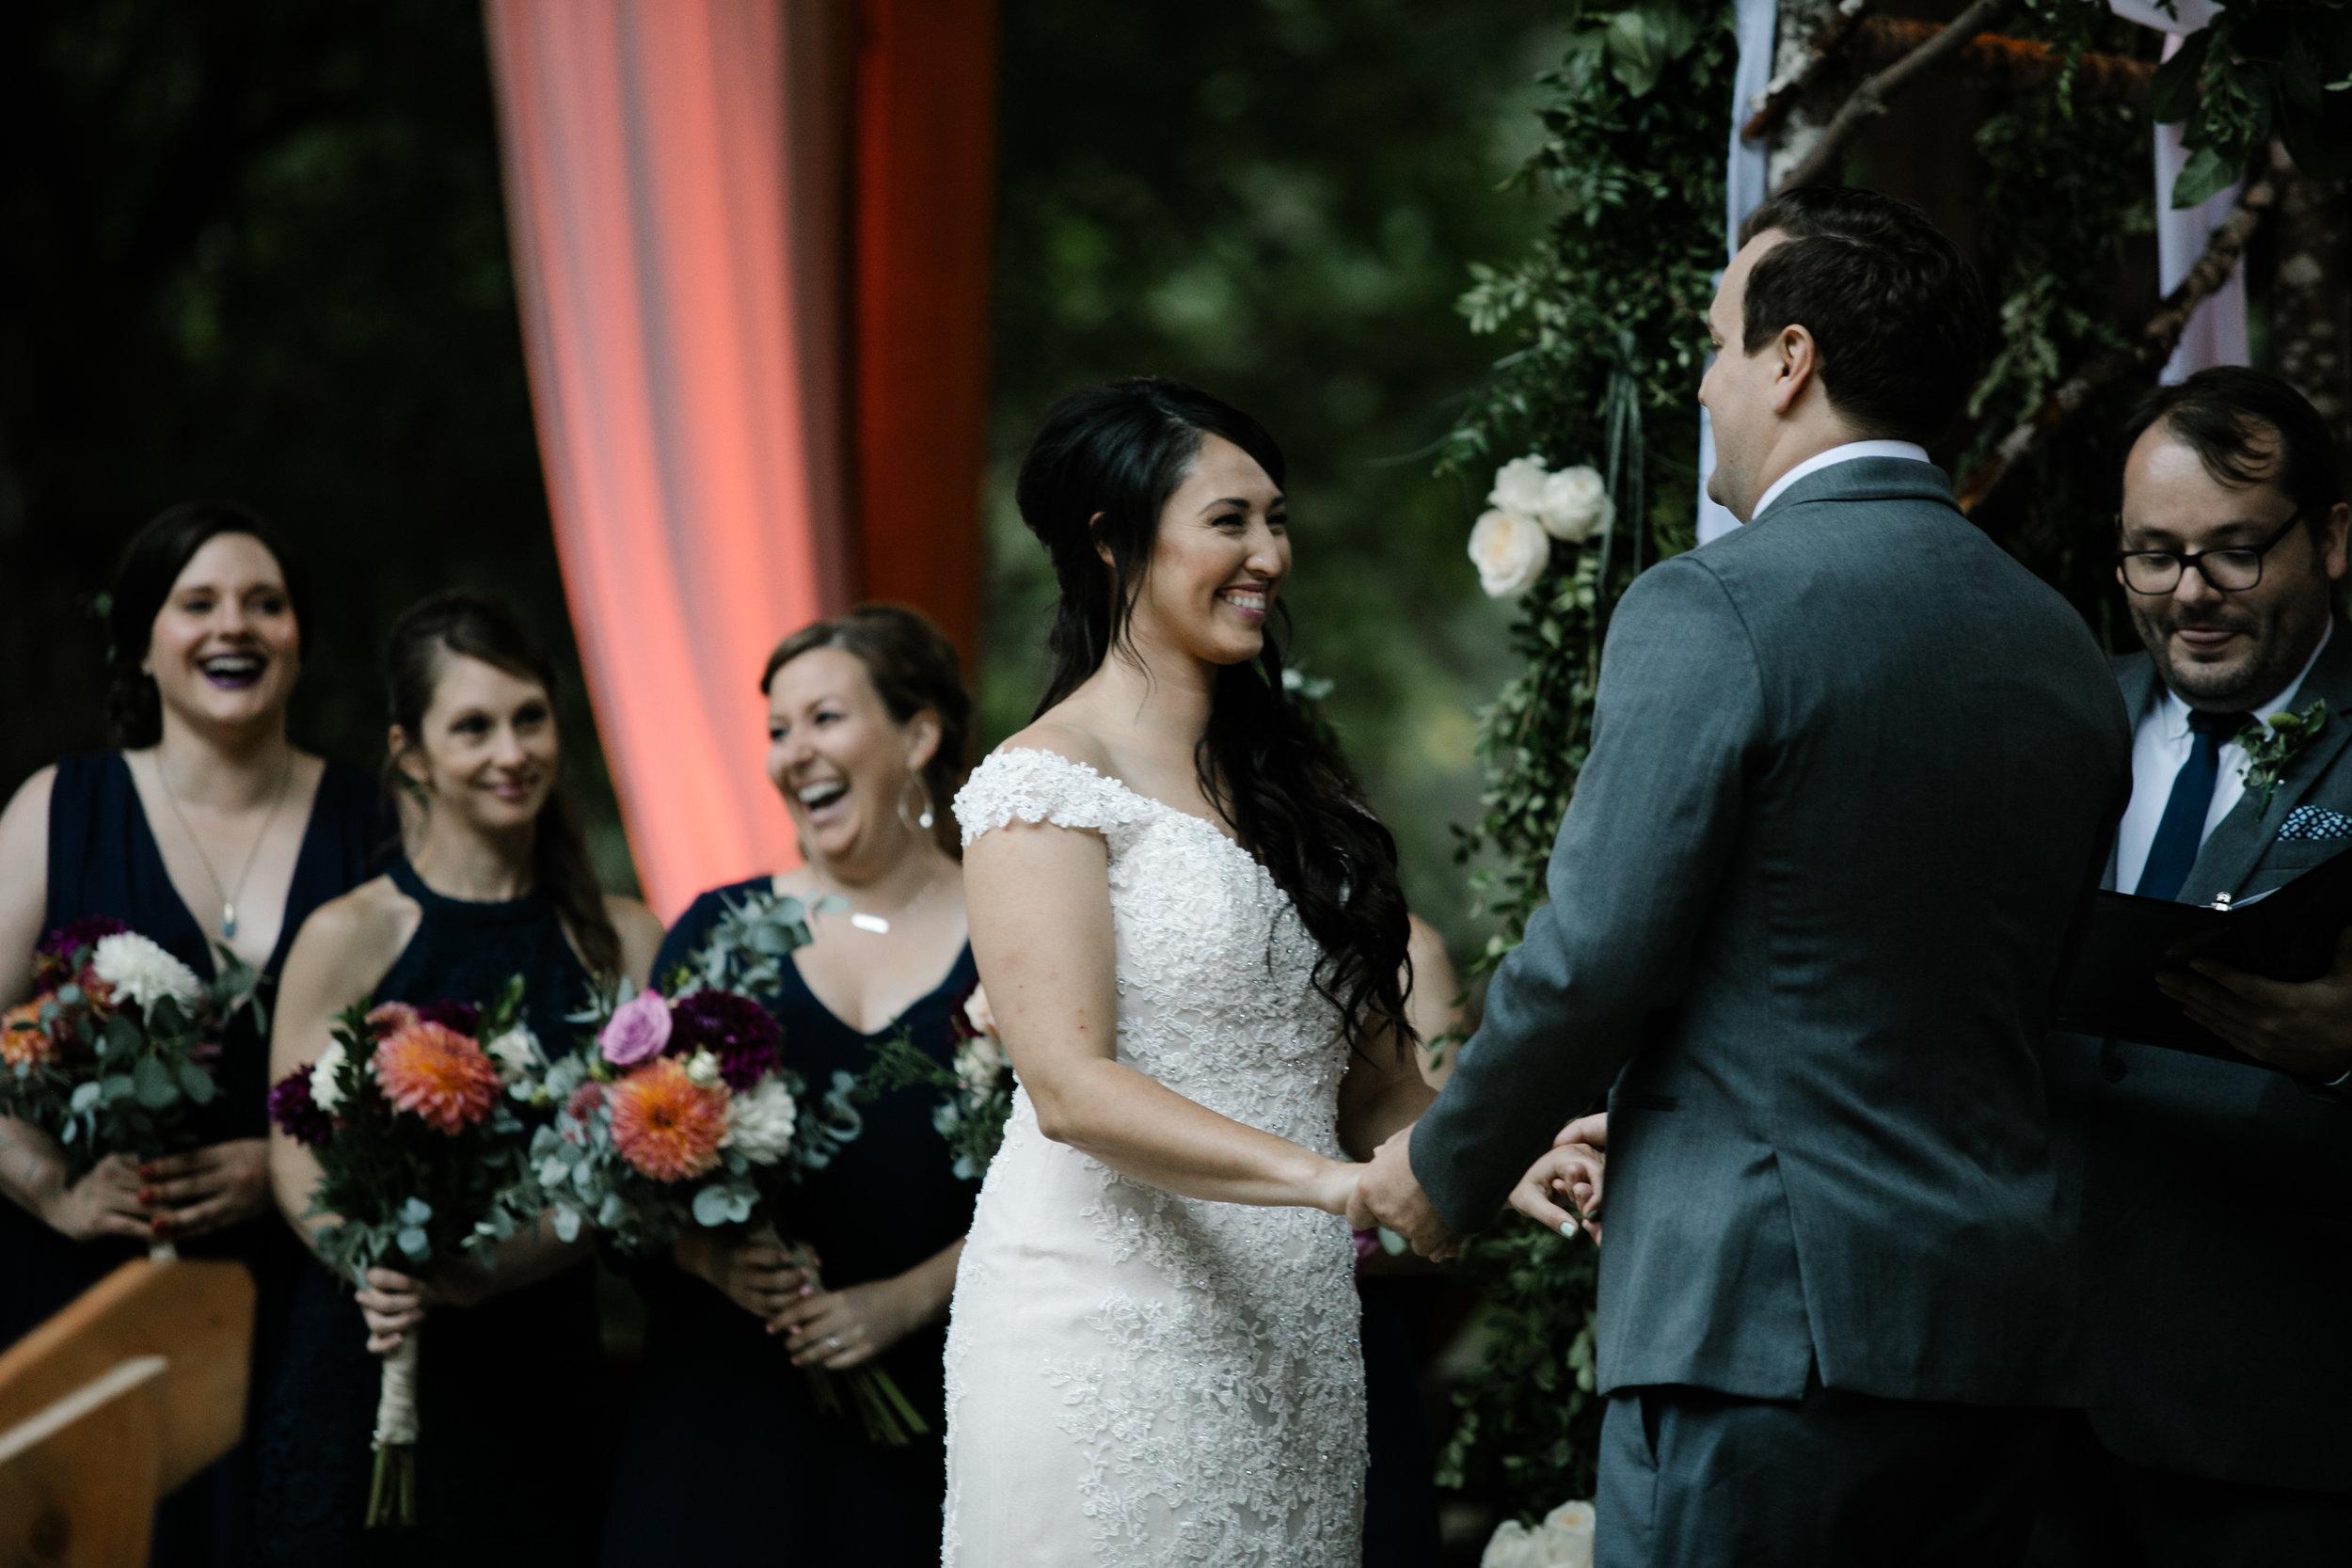 Sevlynn-Photography-Teresa-Chandler-Wedding-52.jpg